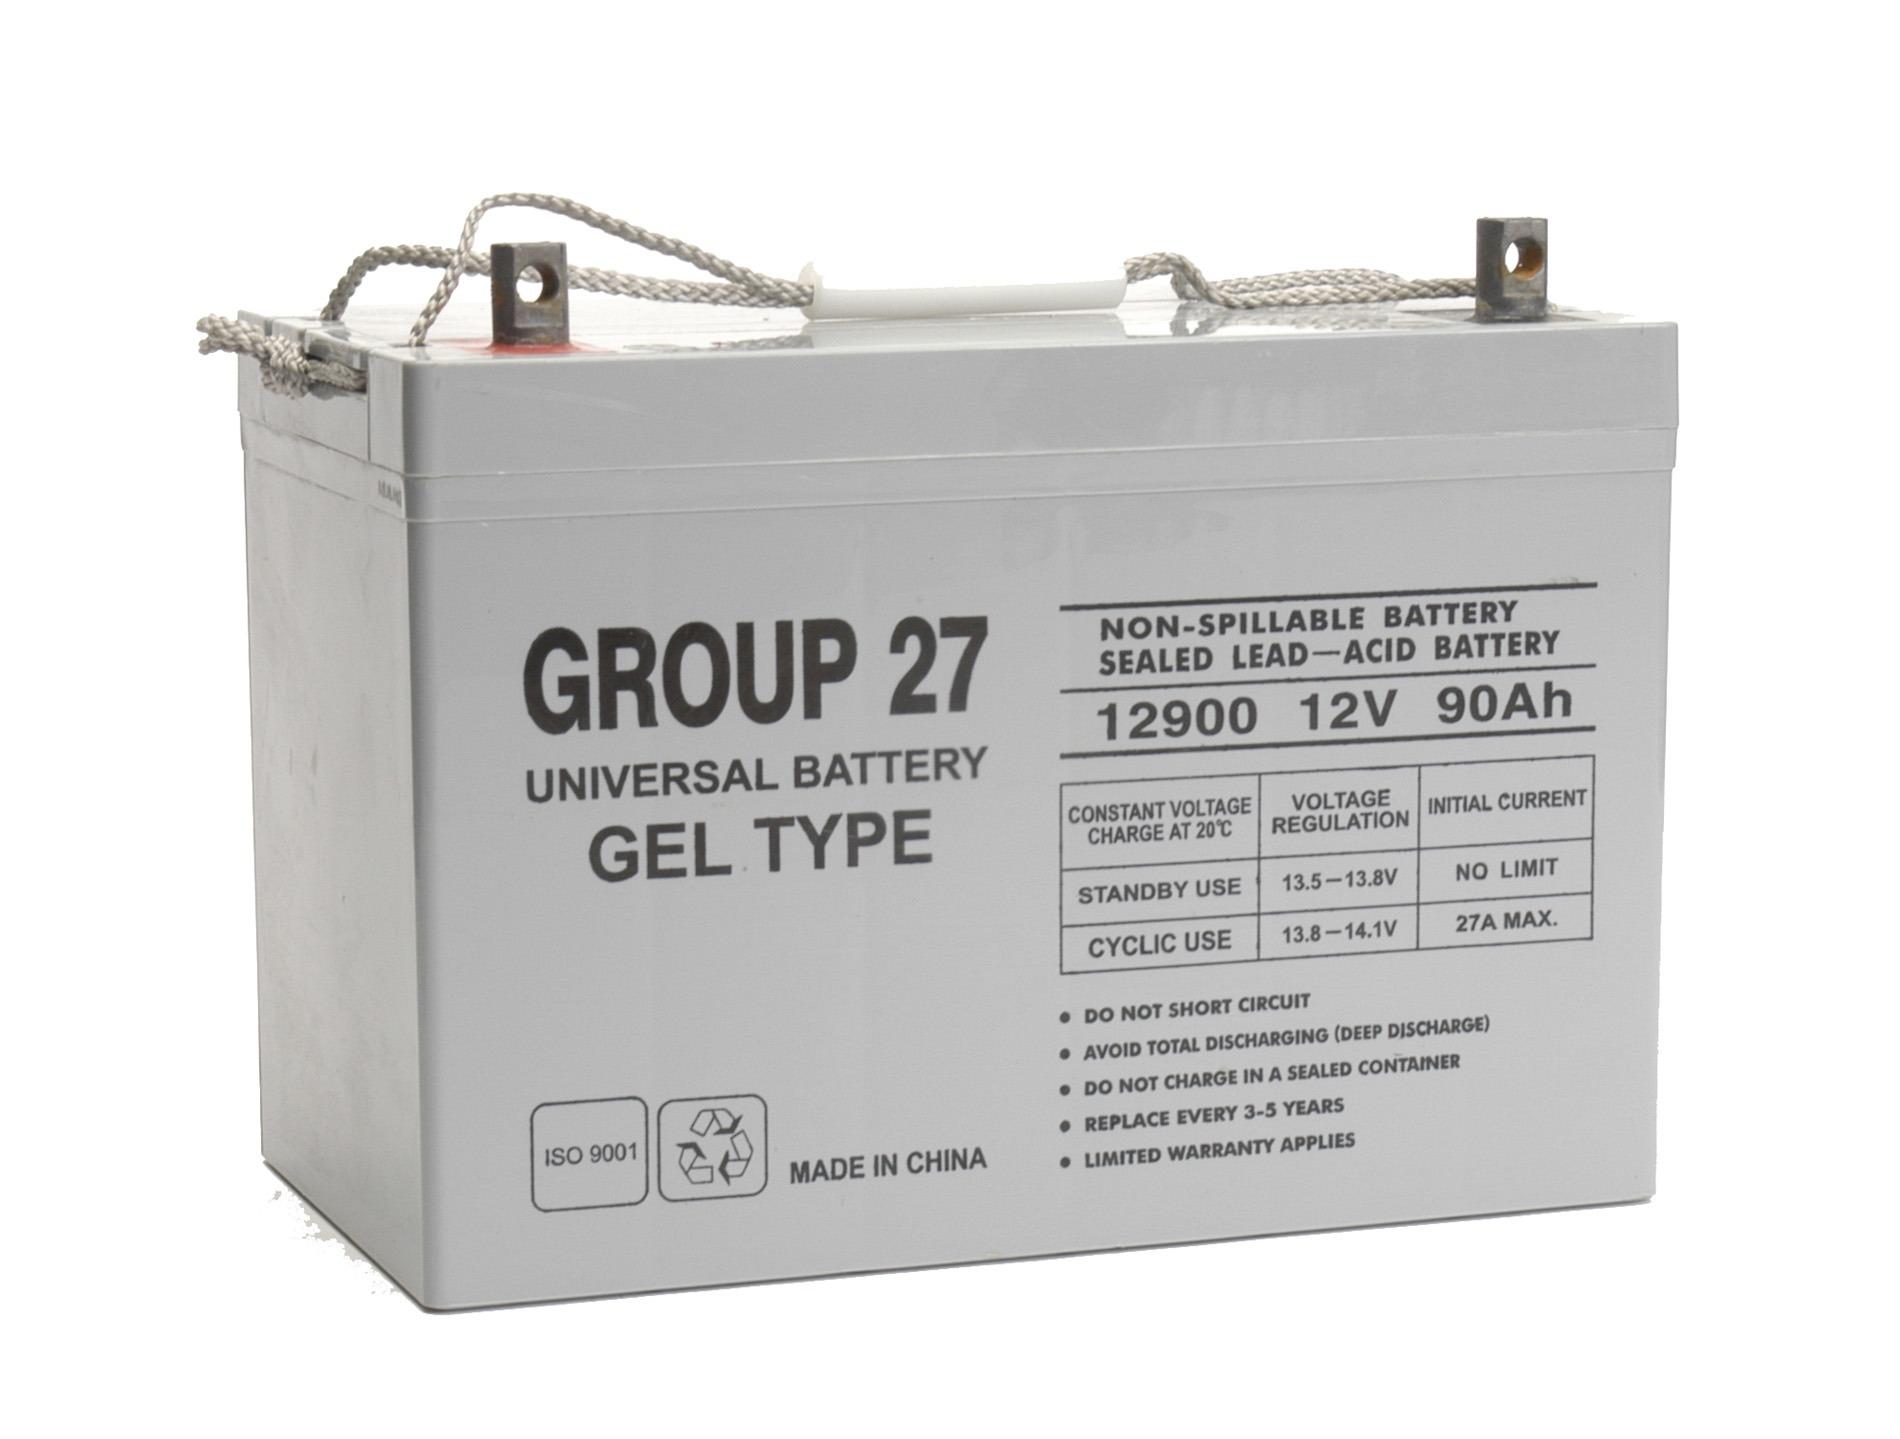 12v 90ah (Group 27) Gel Battery for Nobles Typhoon Floor Machine 747B 17B 20B